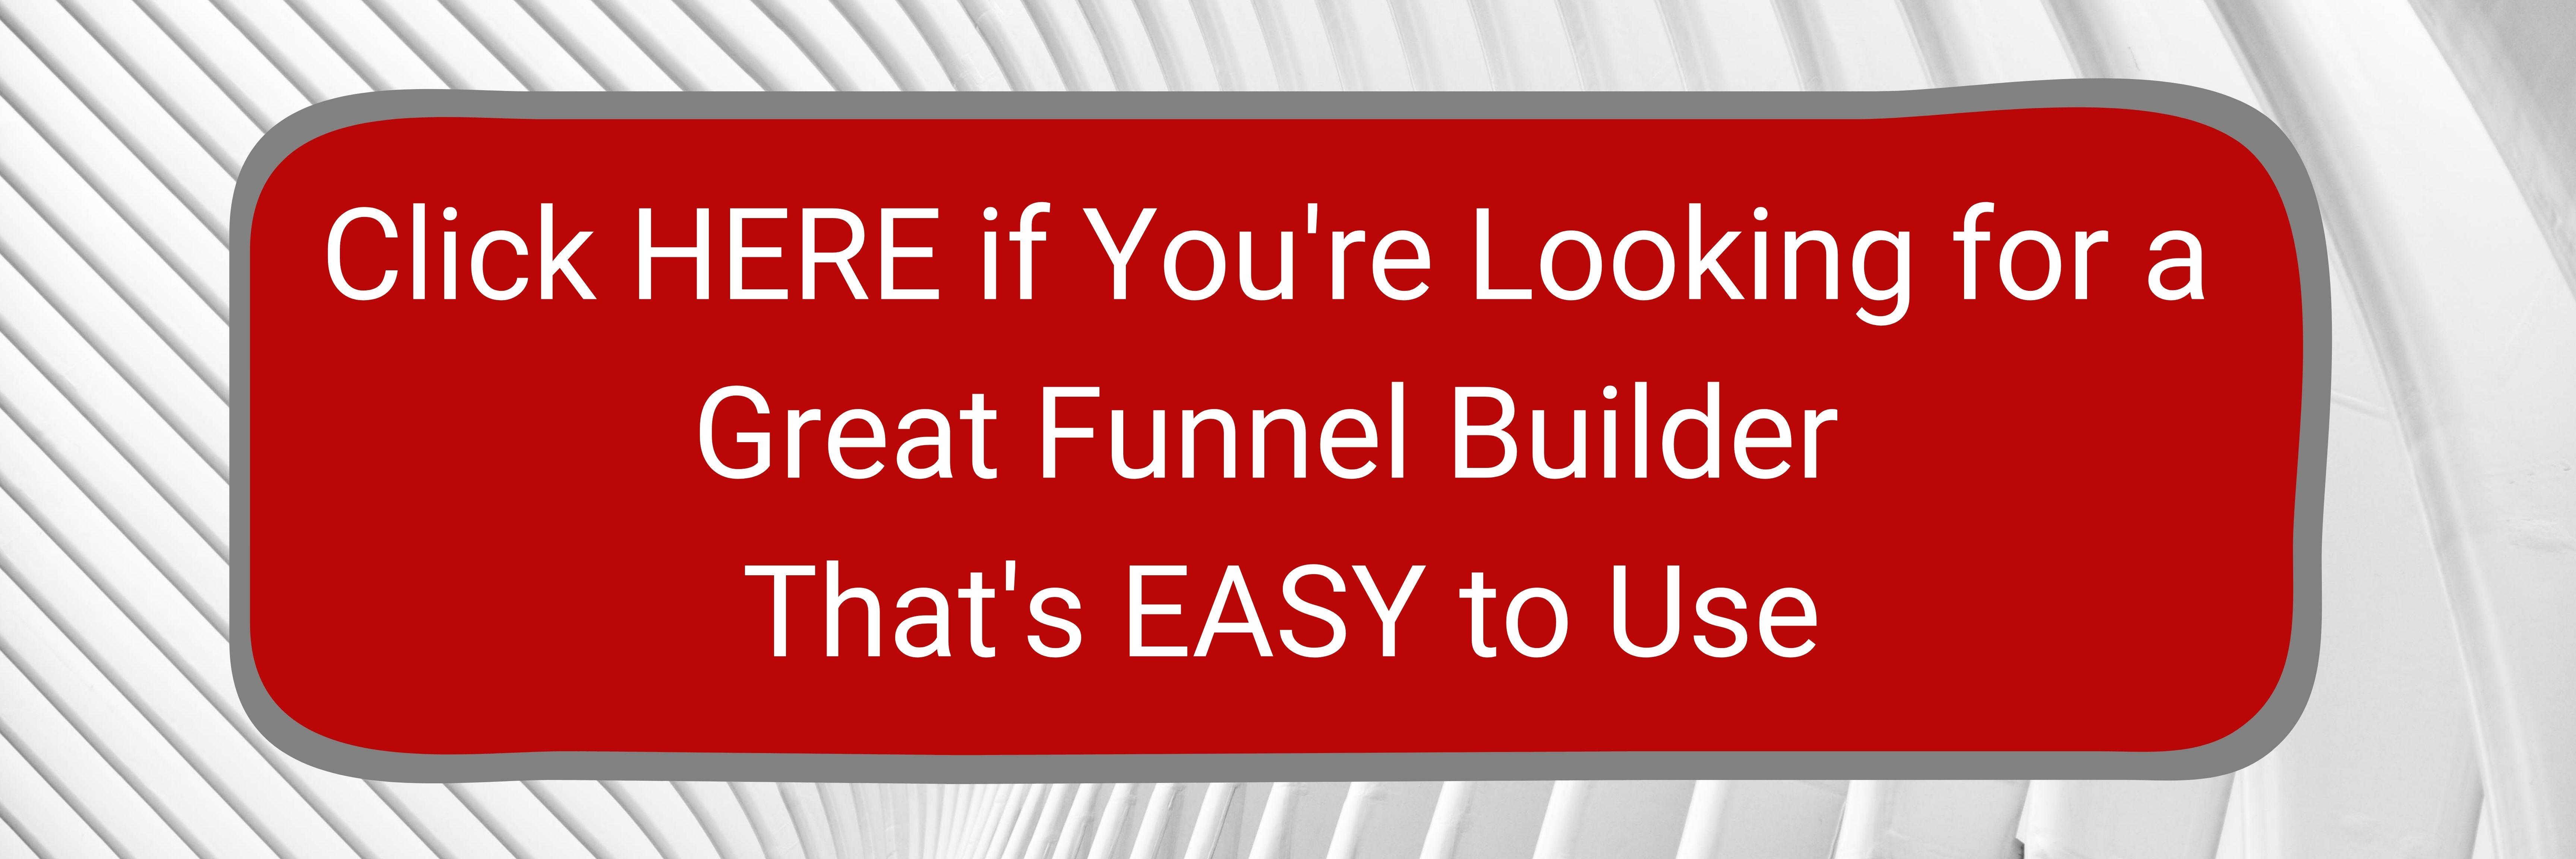 Ways College Students Can Make Money Online - Funnel Builder Banner